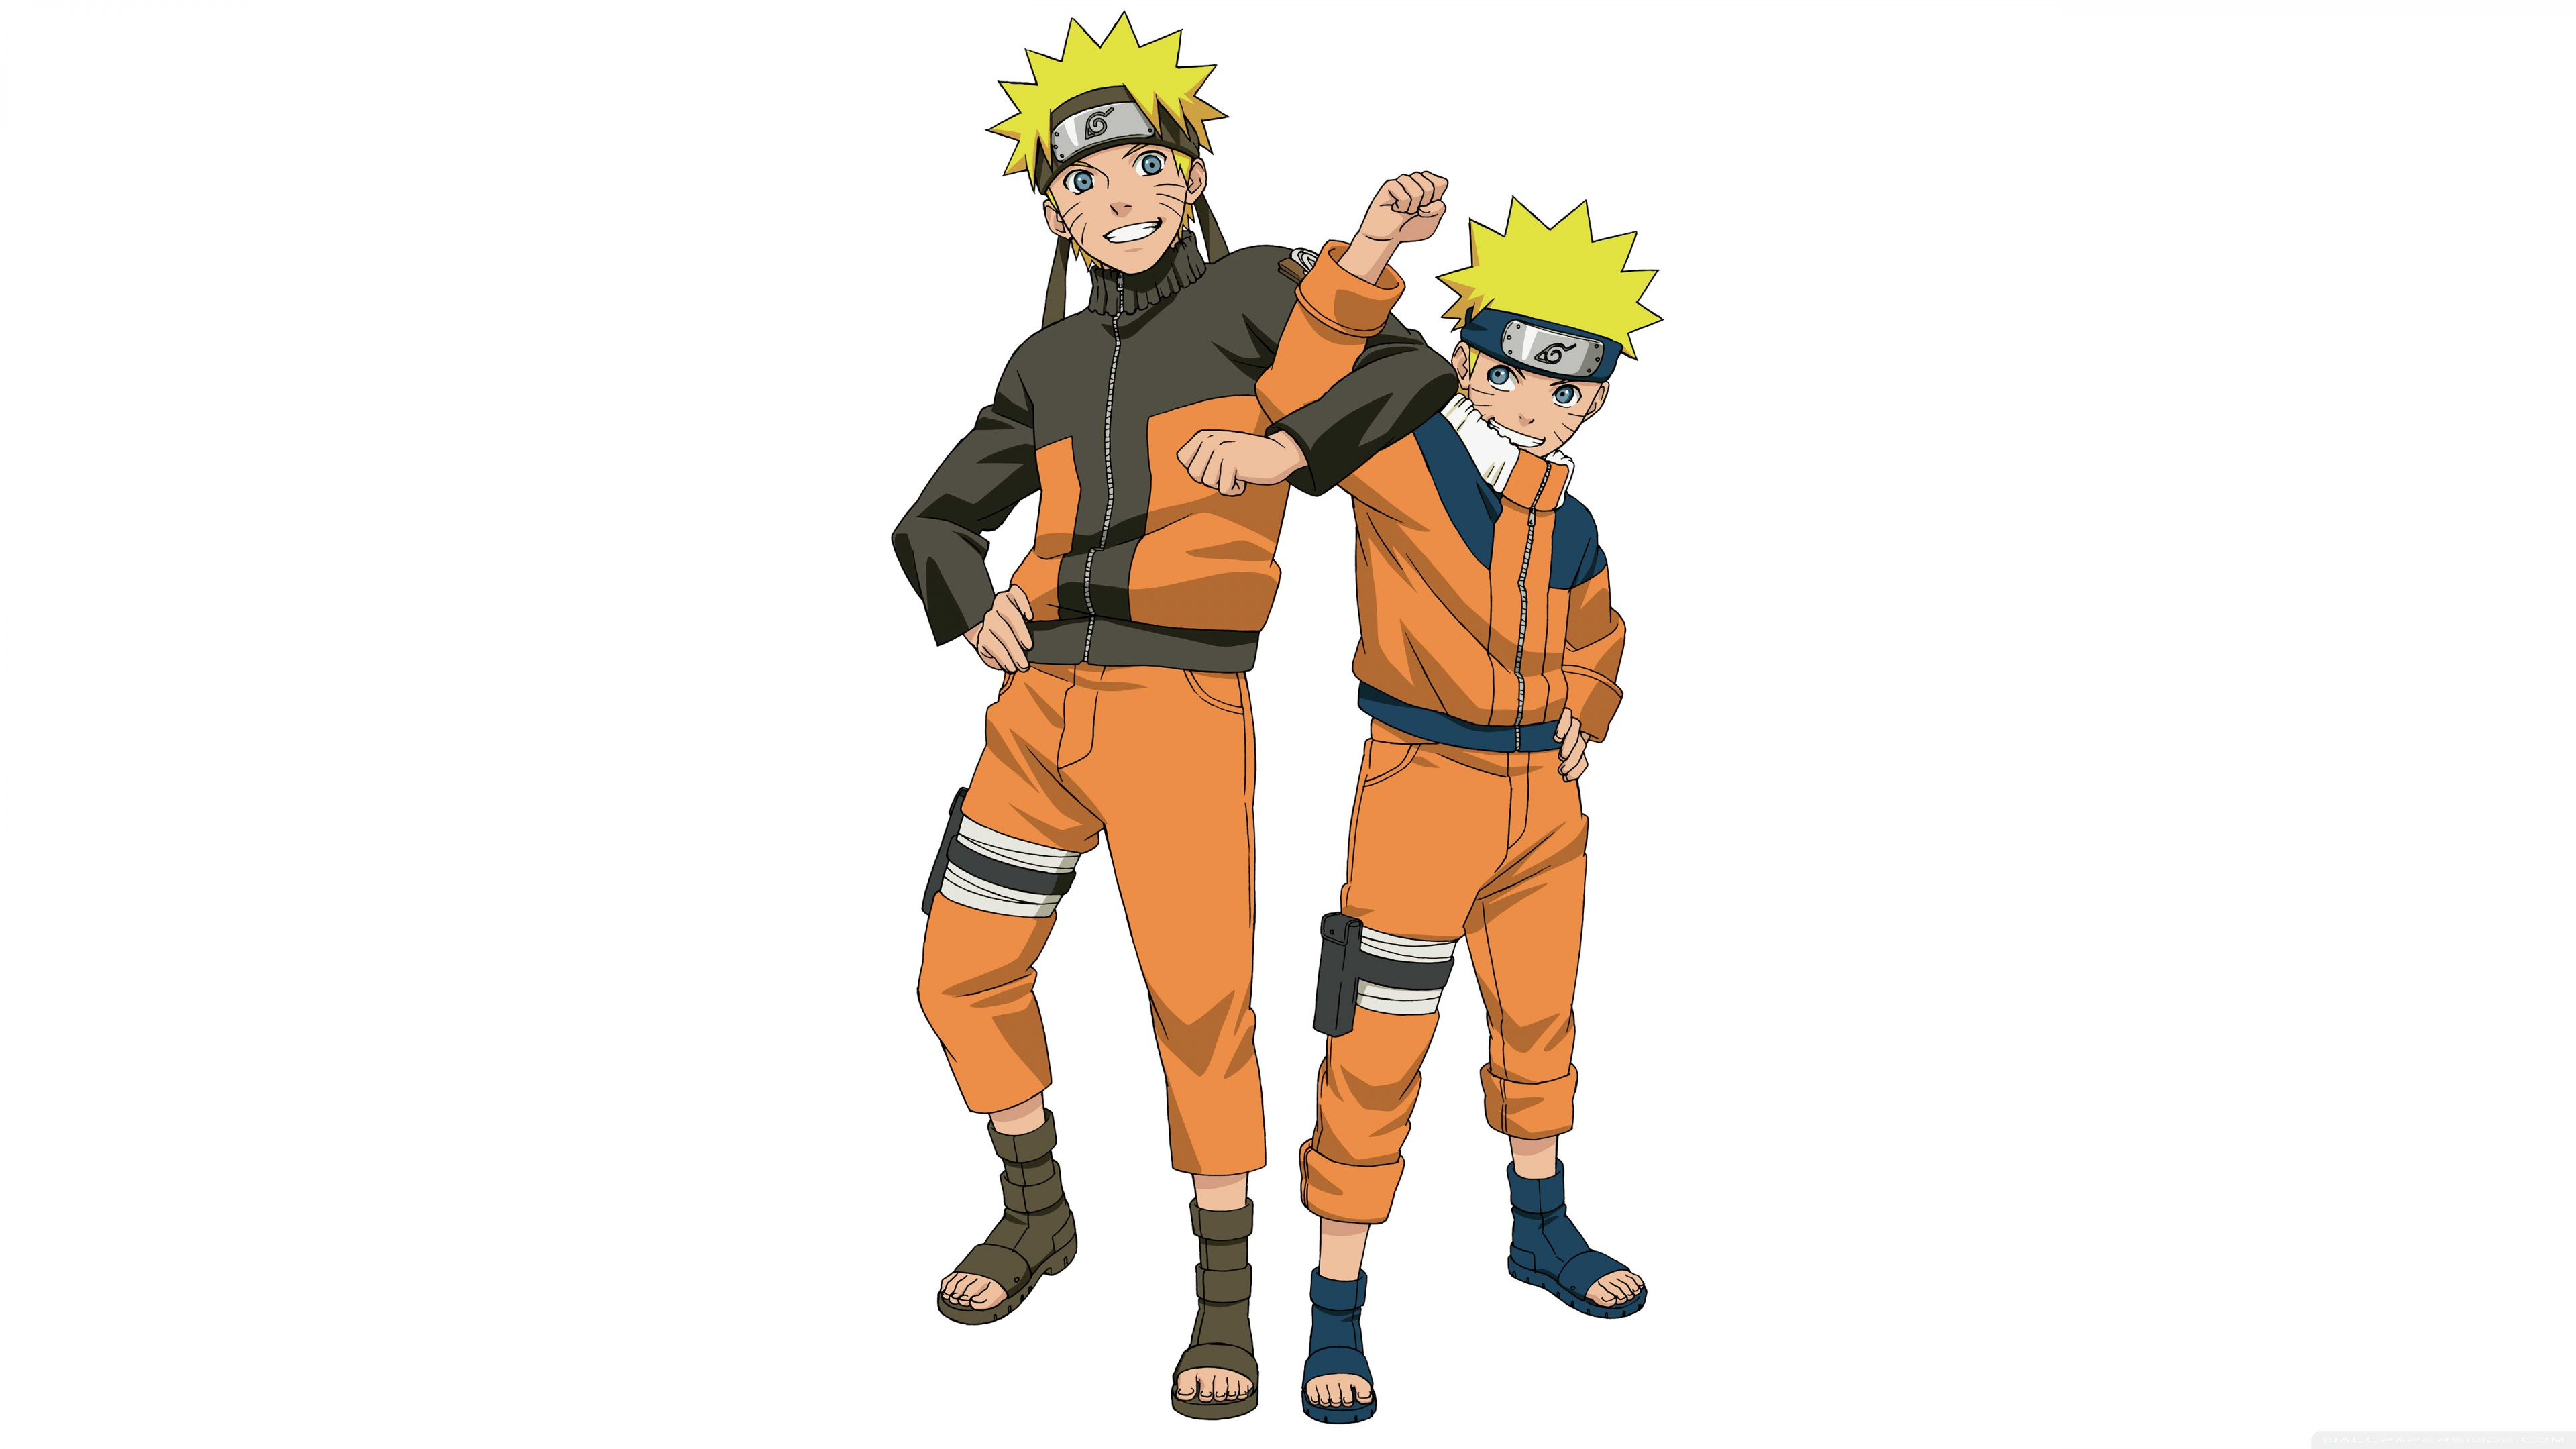 17 Anime Wallpaper 4 K Naruto Wallpaper Download